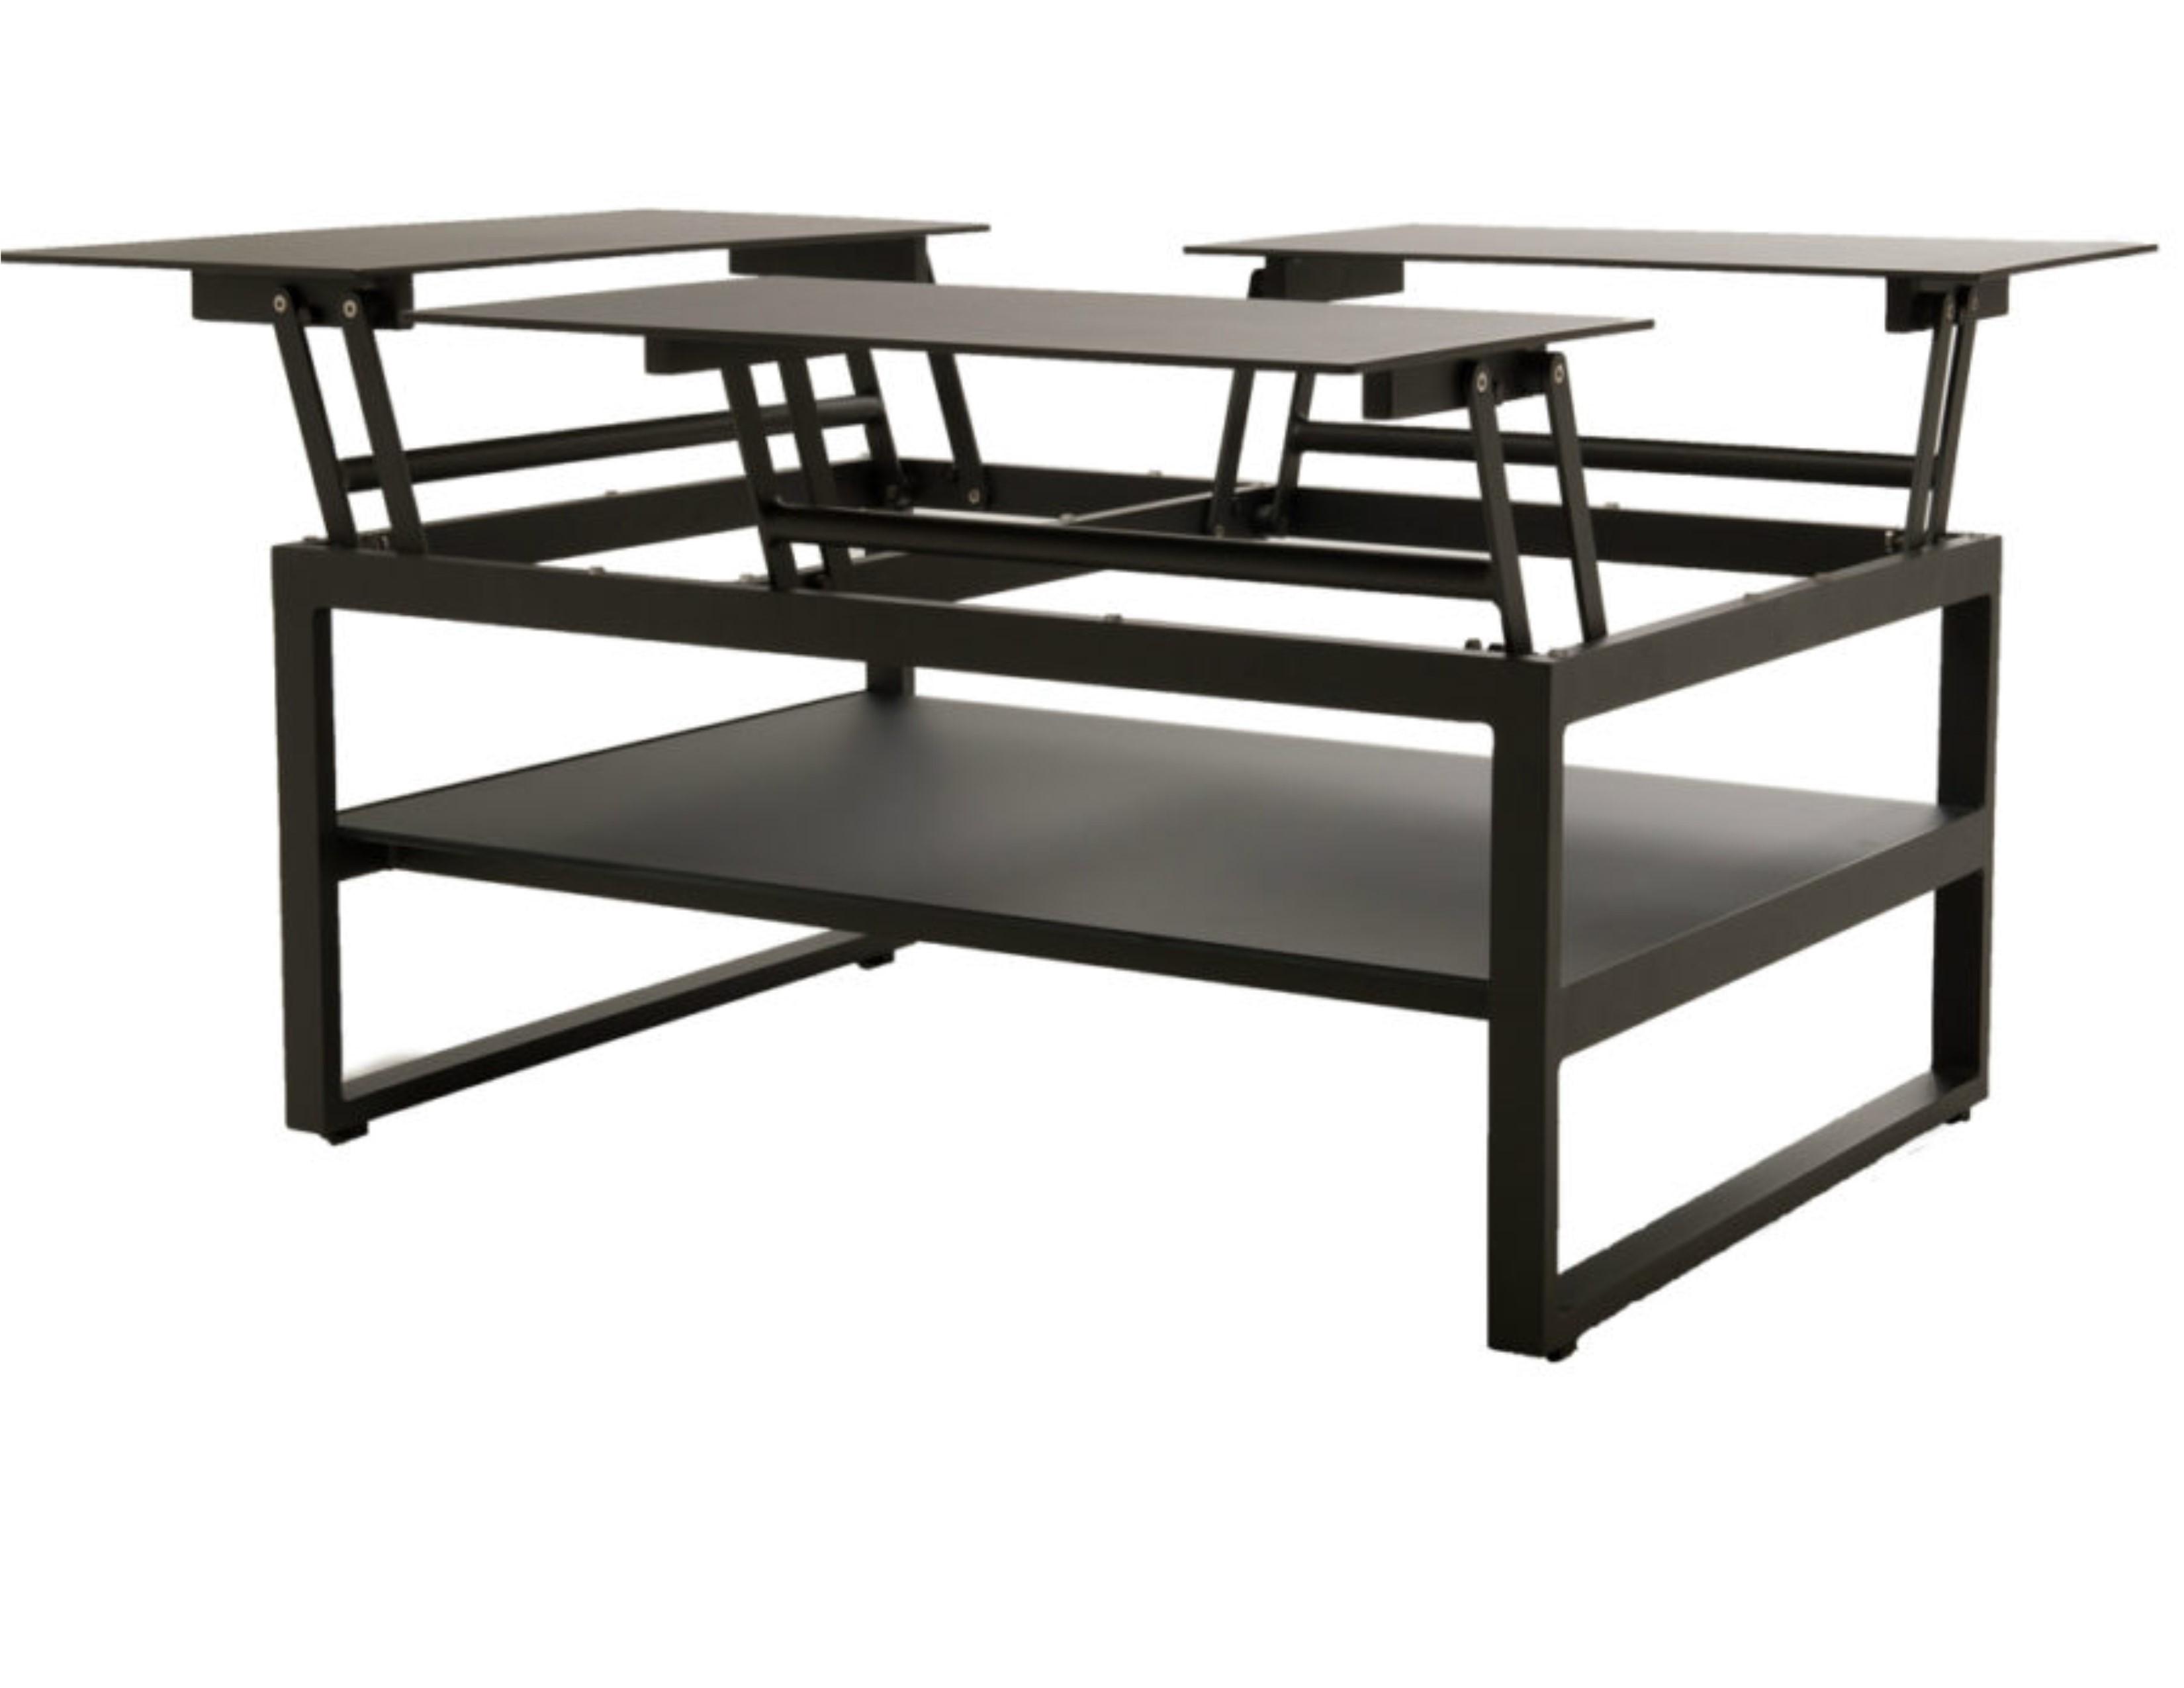 Bon Popup Tray Coffee Table Multiple Tv Tray Lifting Pop Up Modern Urban  Design Hotel